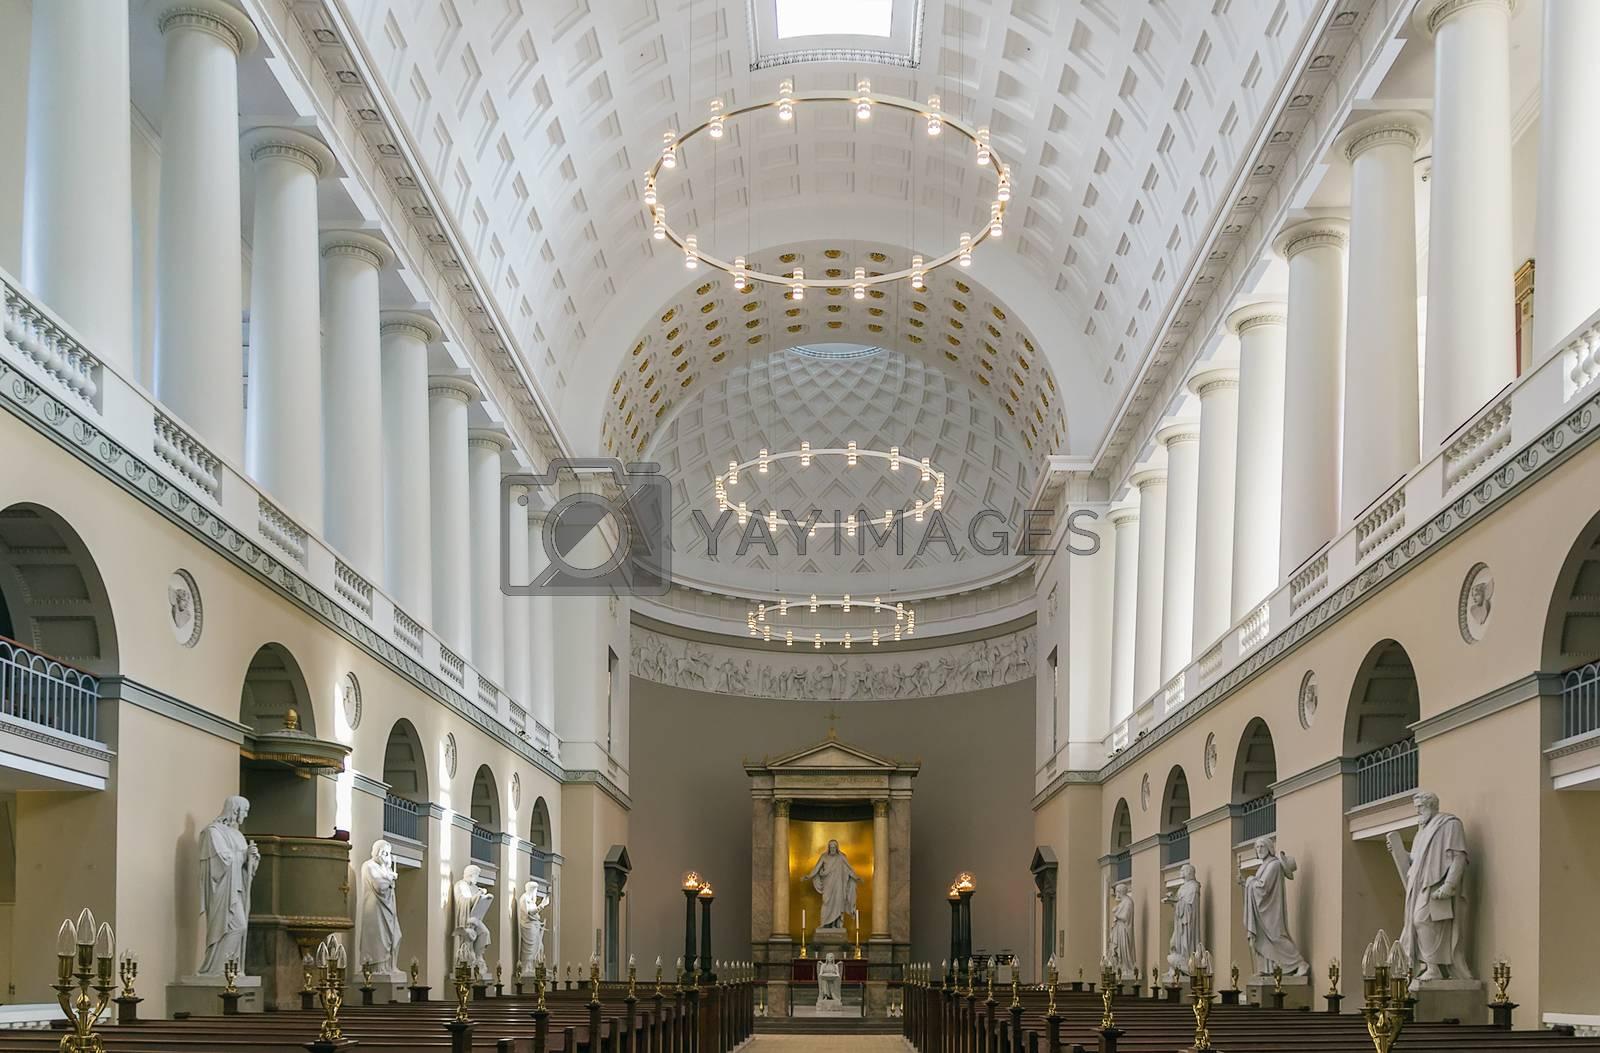 Church of Our Lady, Copenhagen by borisb17